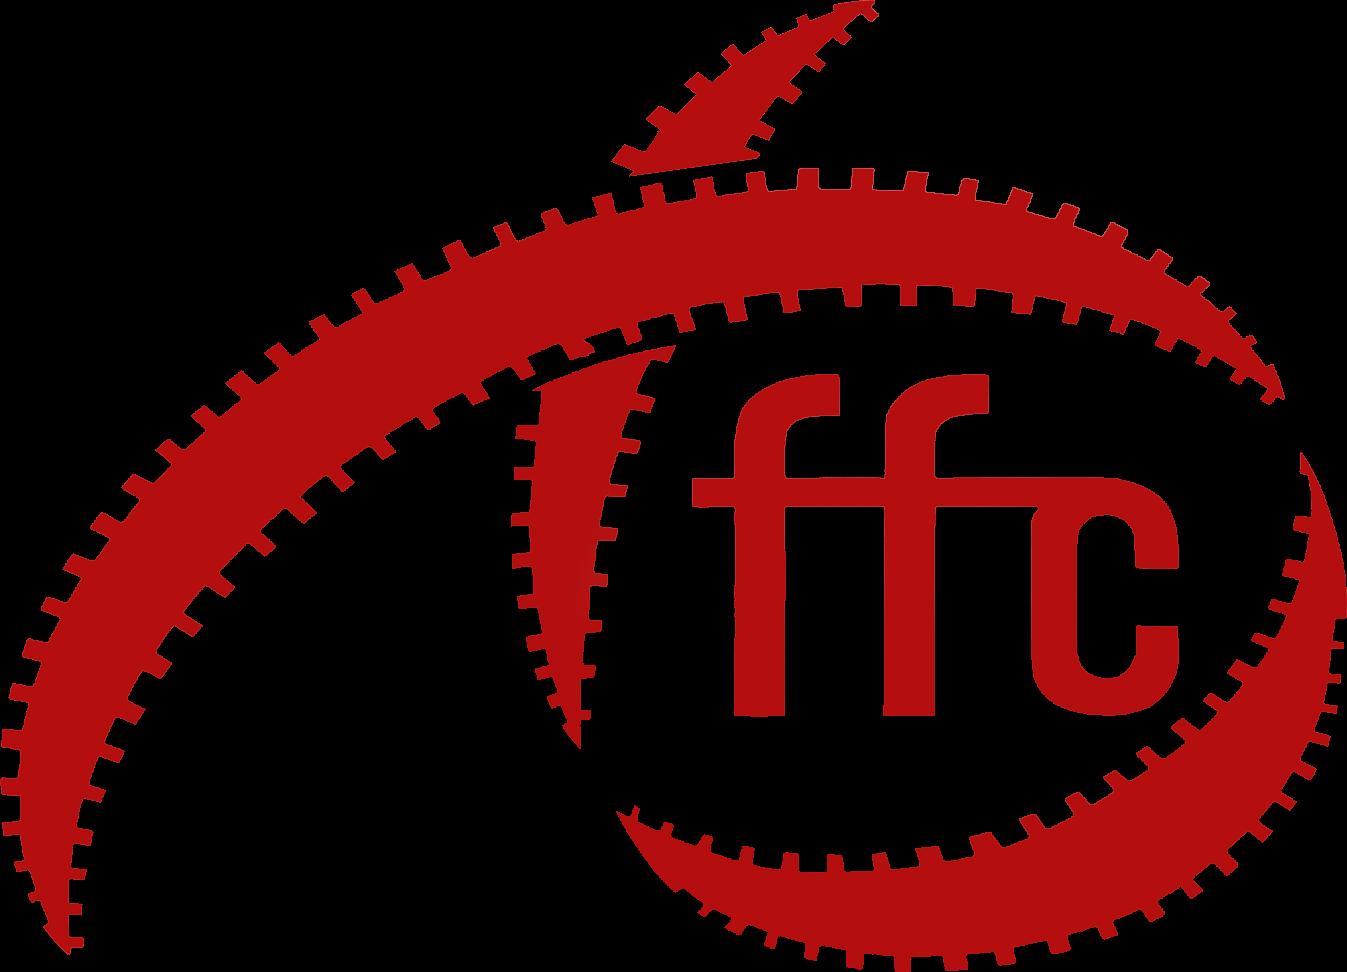 FFC Hildesheim